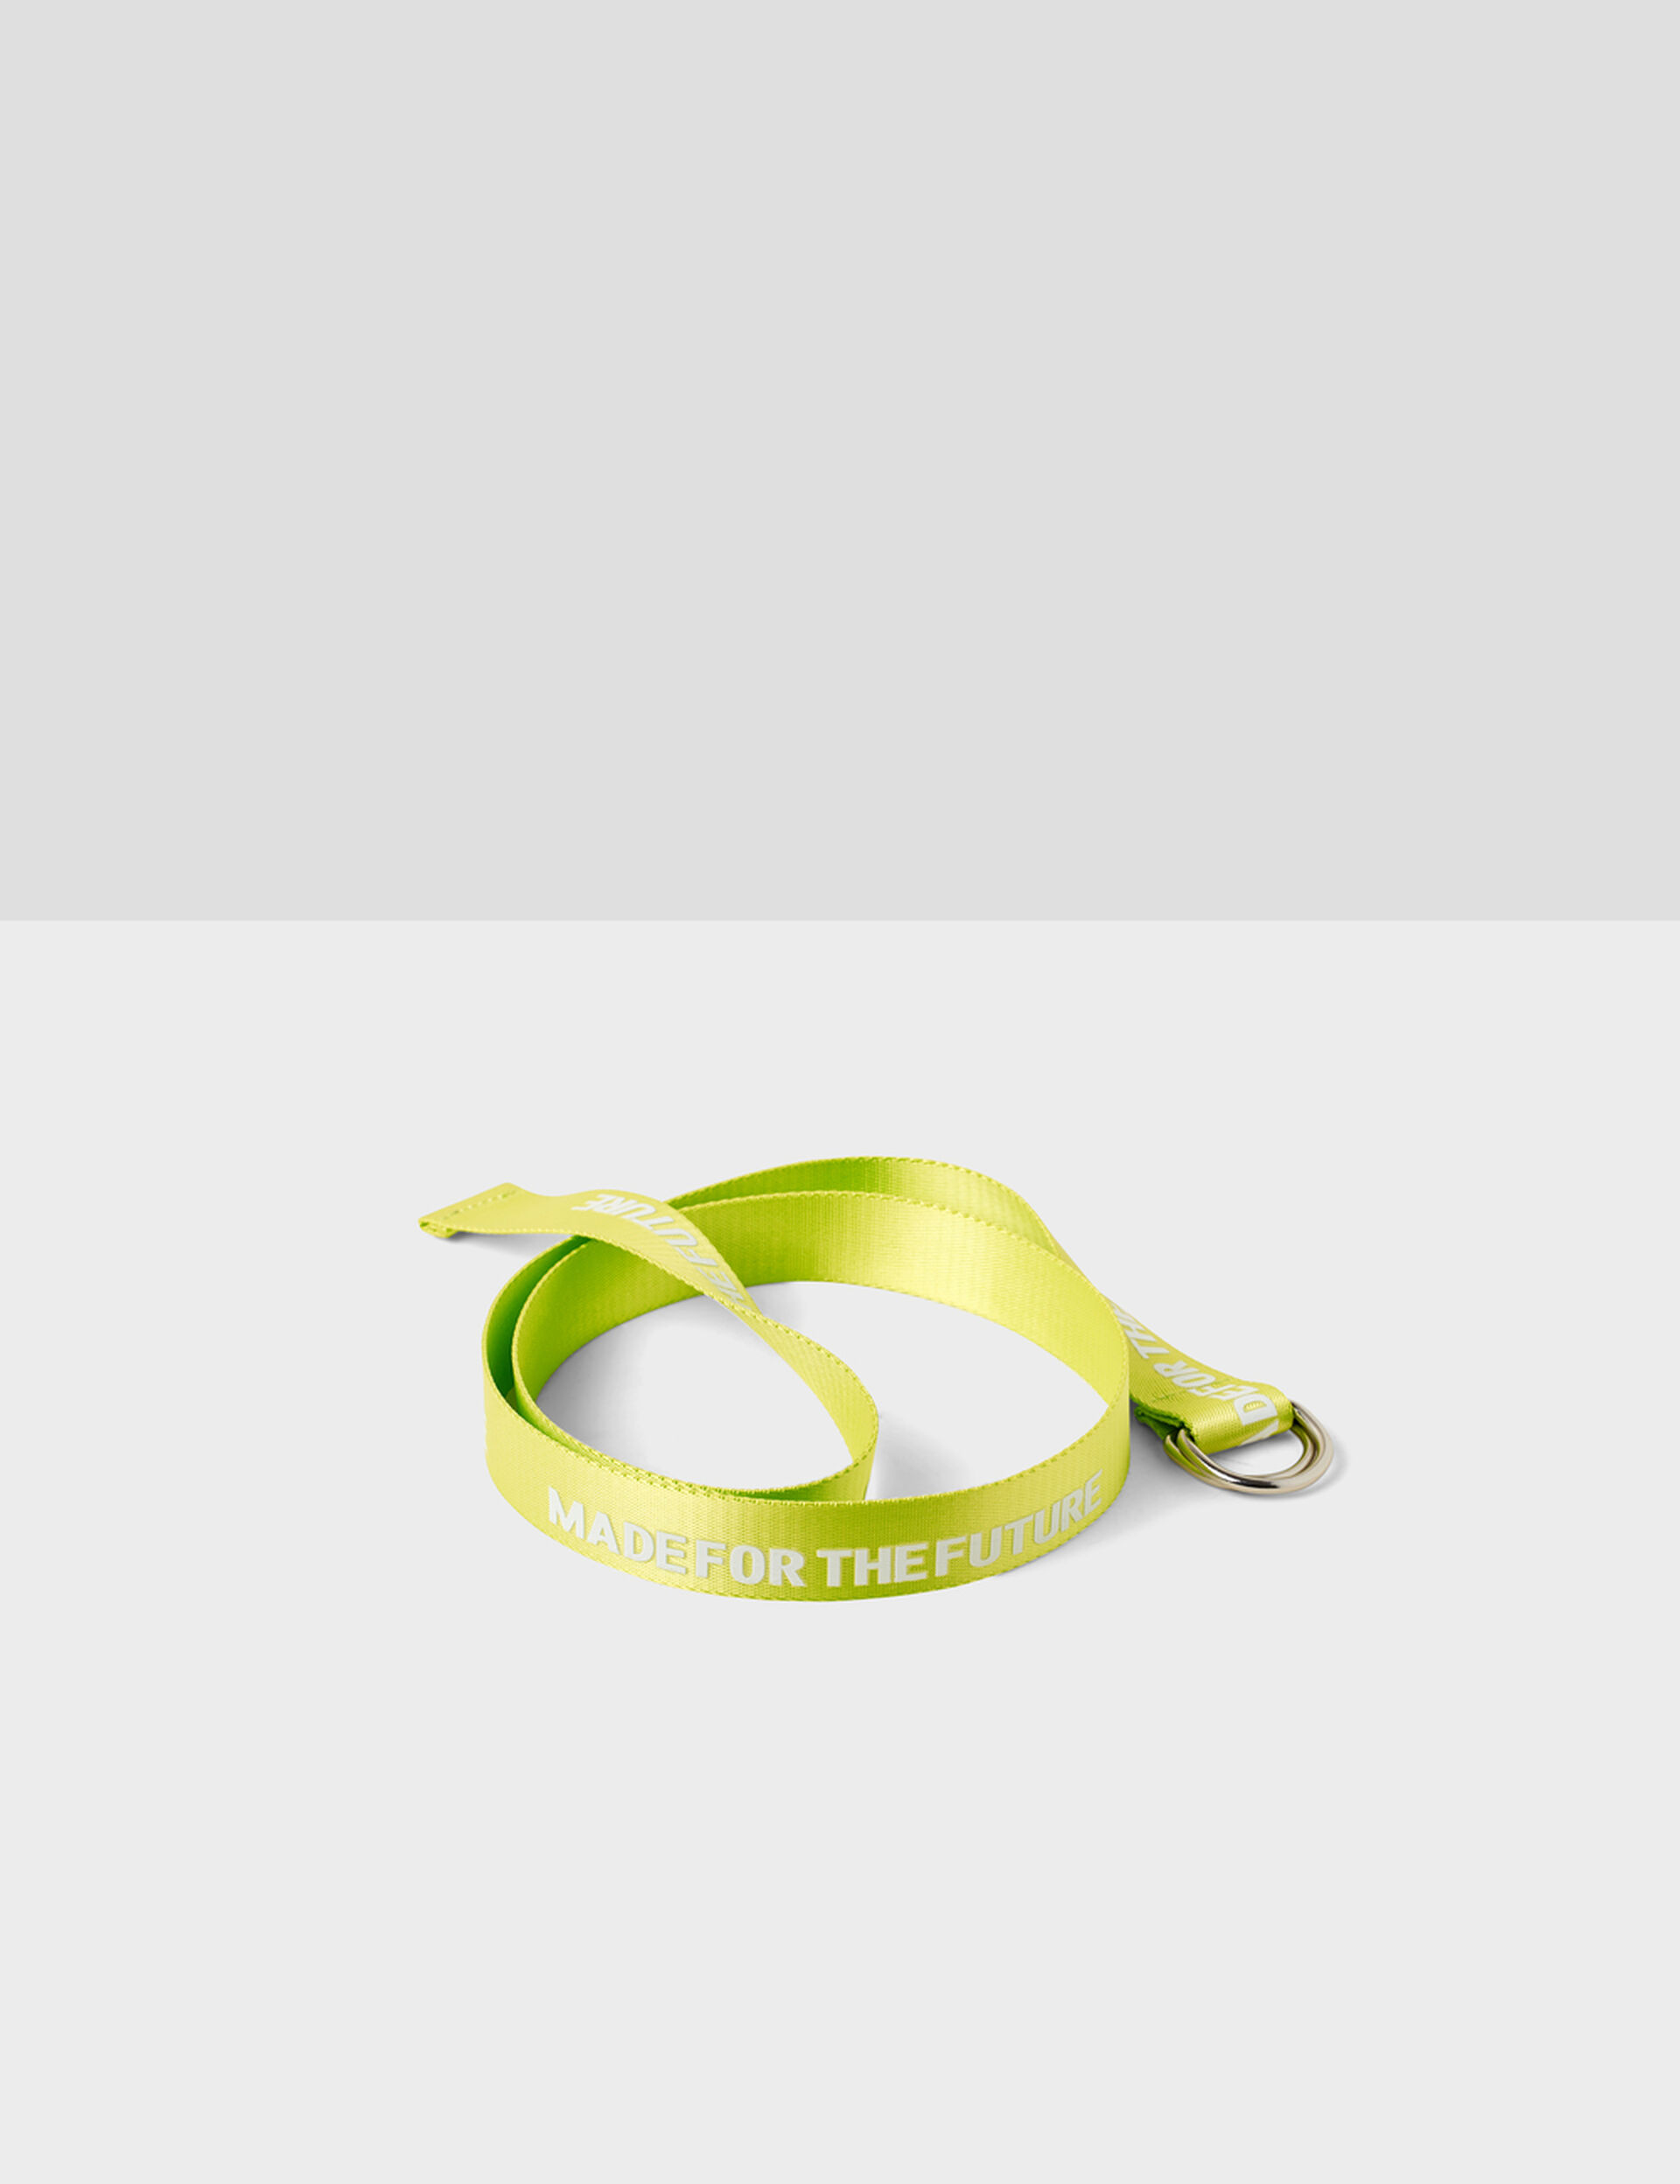 Ceinture made for the future jaune fluo